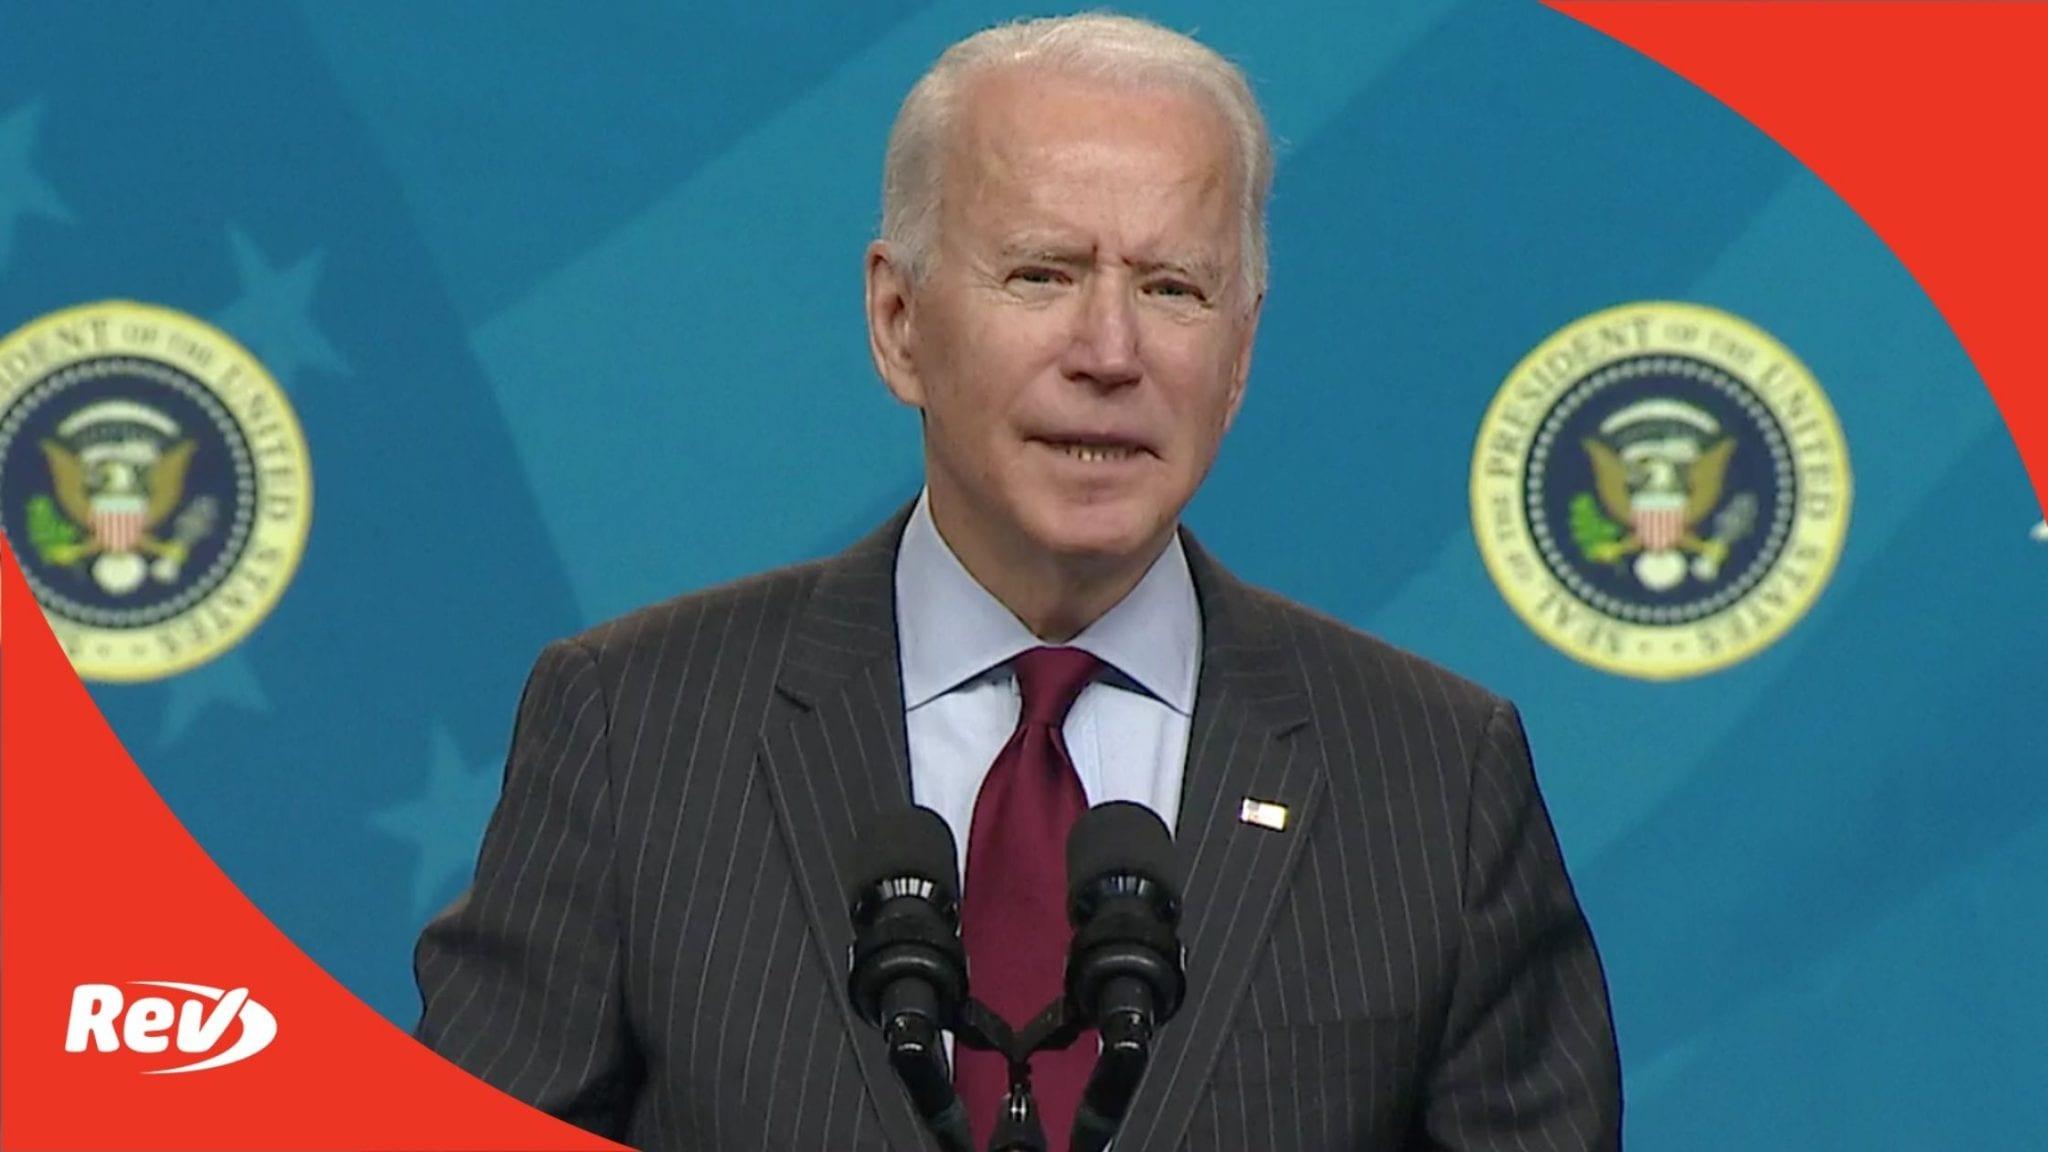 Joe Biden Announcement on PPP for Small Businesses Transcript February 22